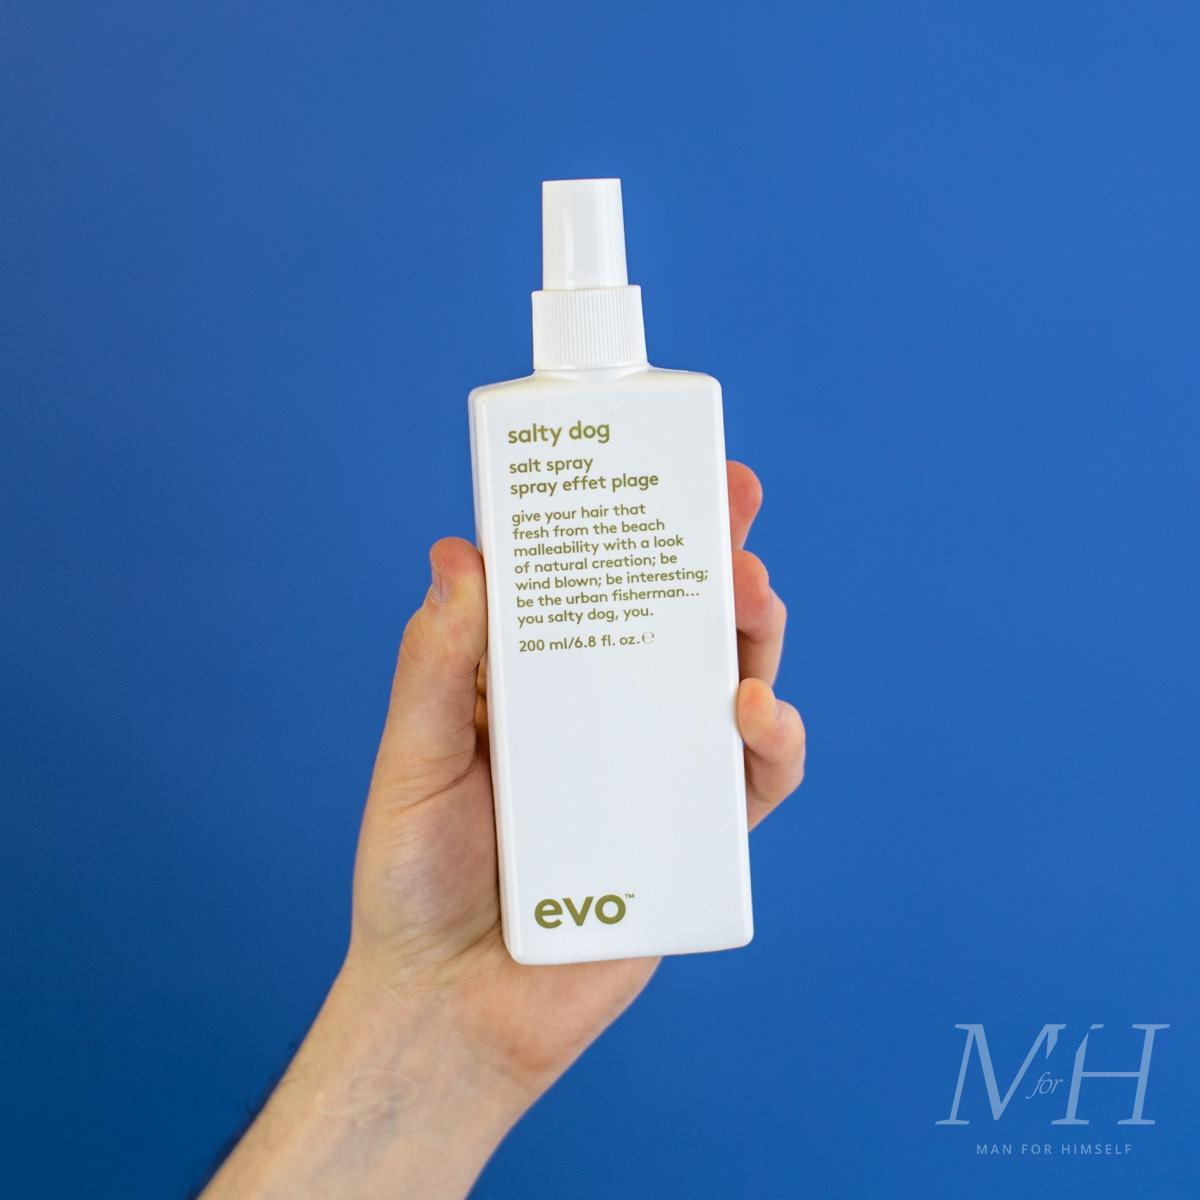 salty-dog-evo-sea-salt-spray-product-review-man-for-himself